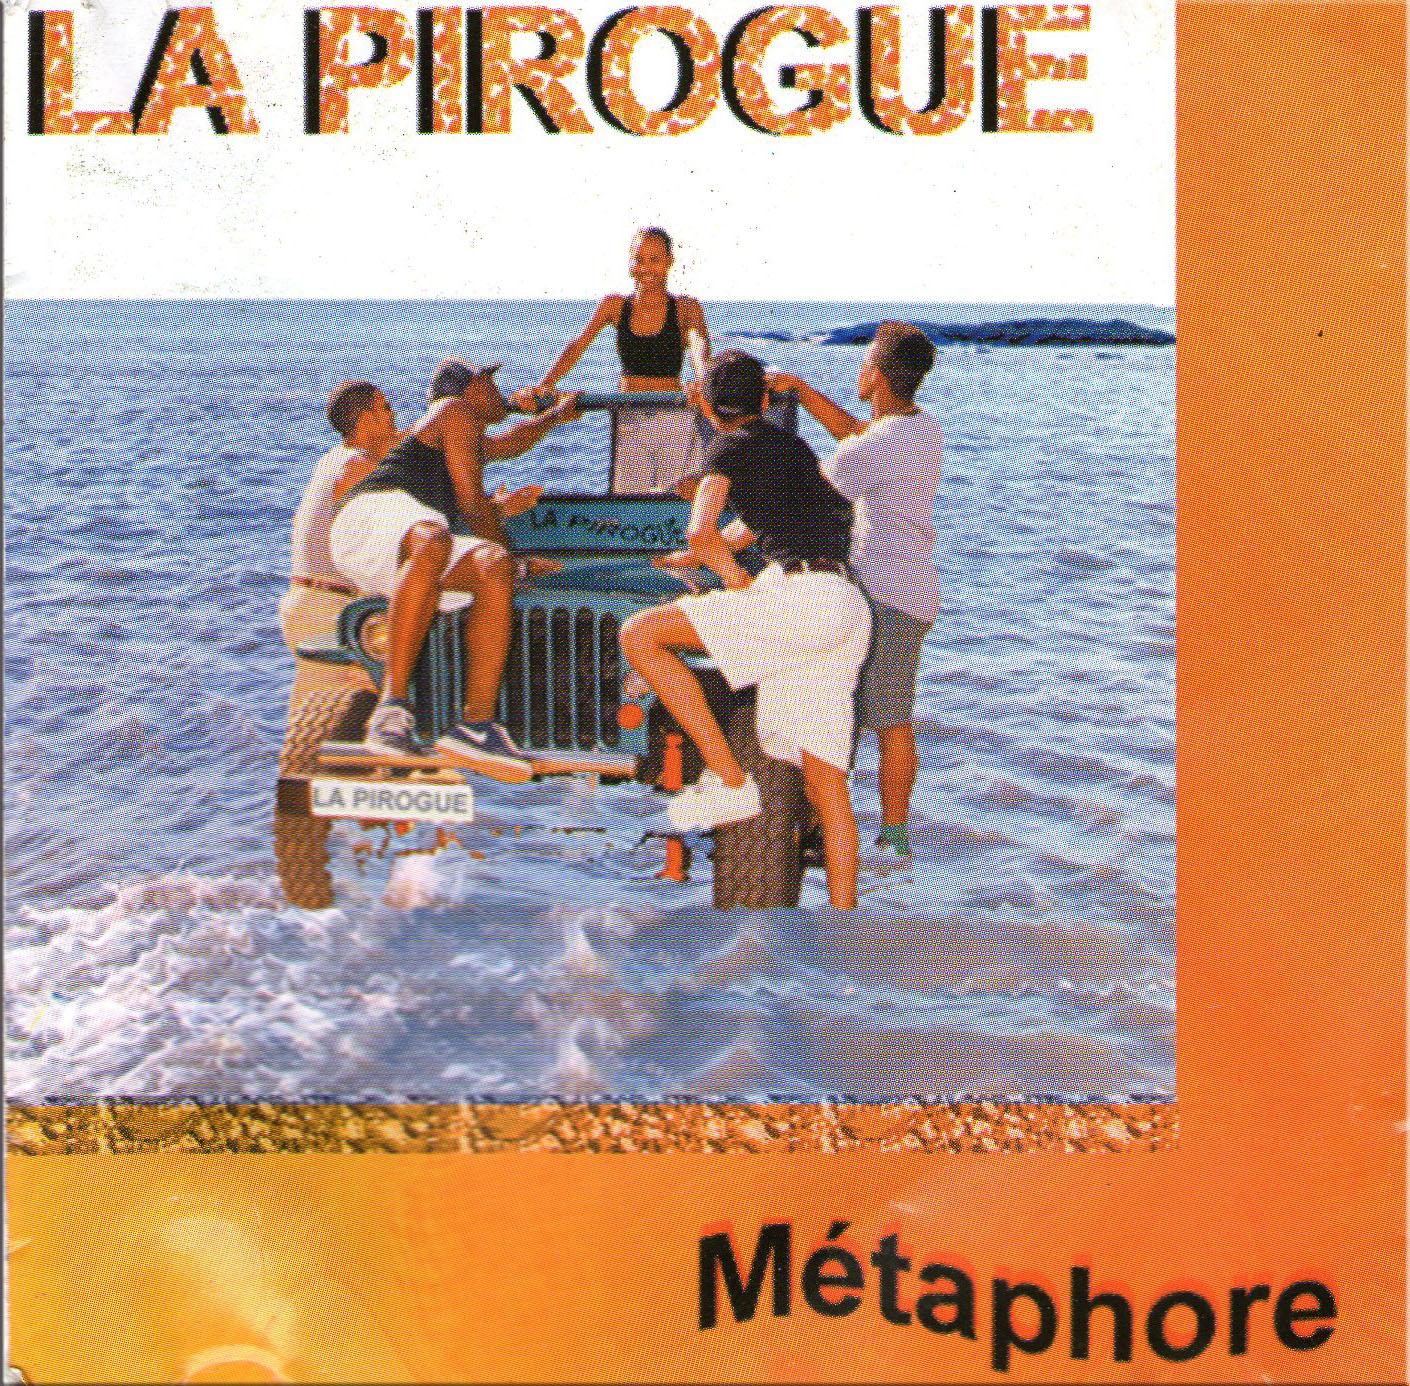 La Pirogue2